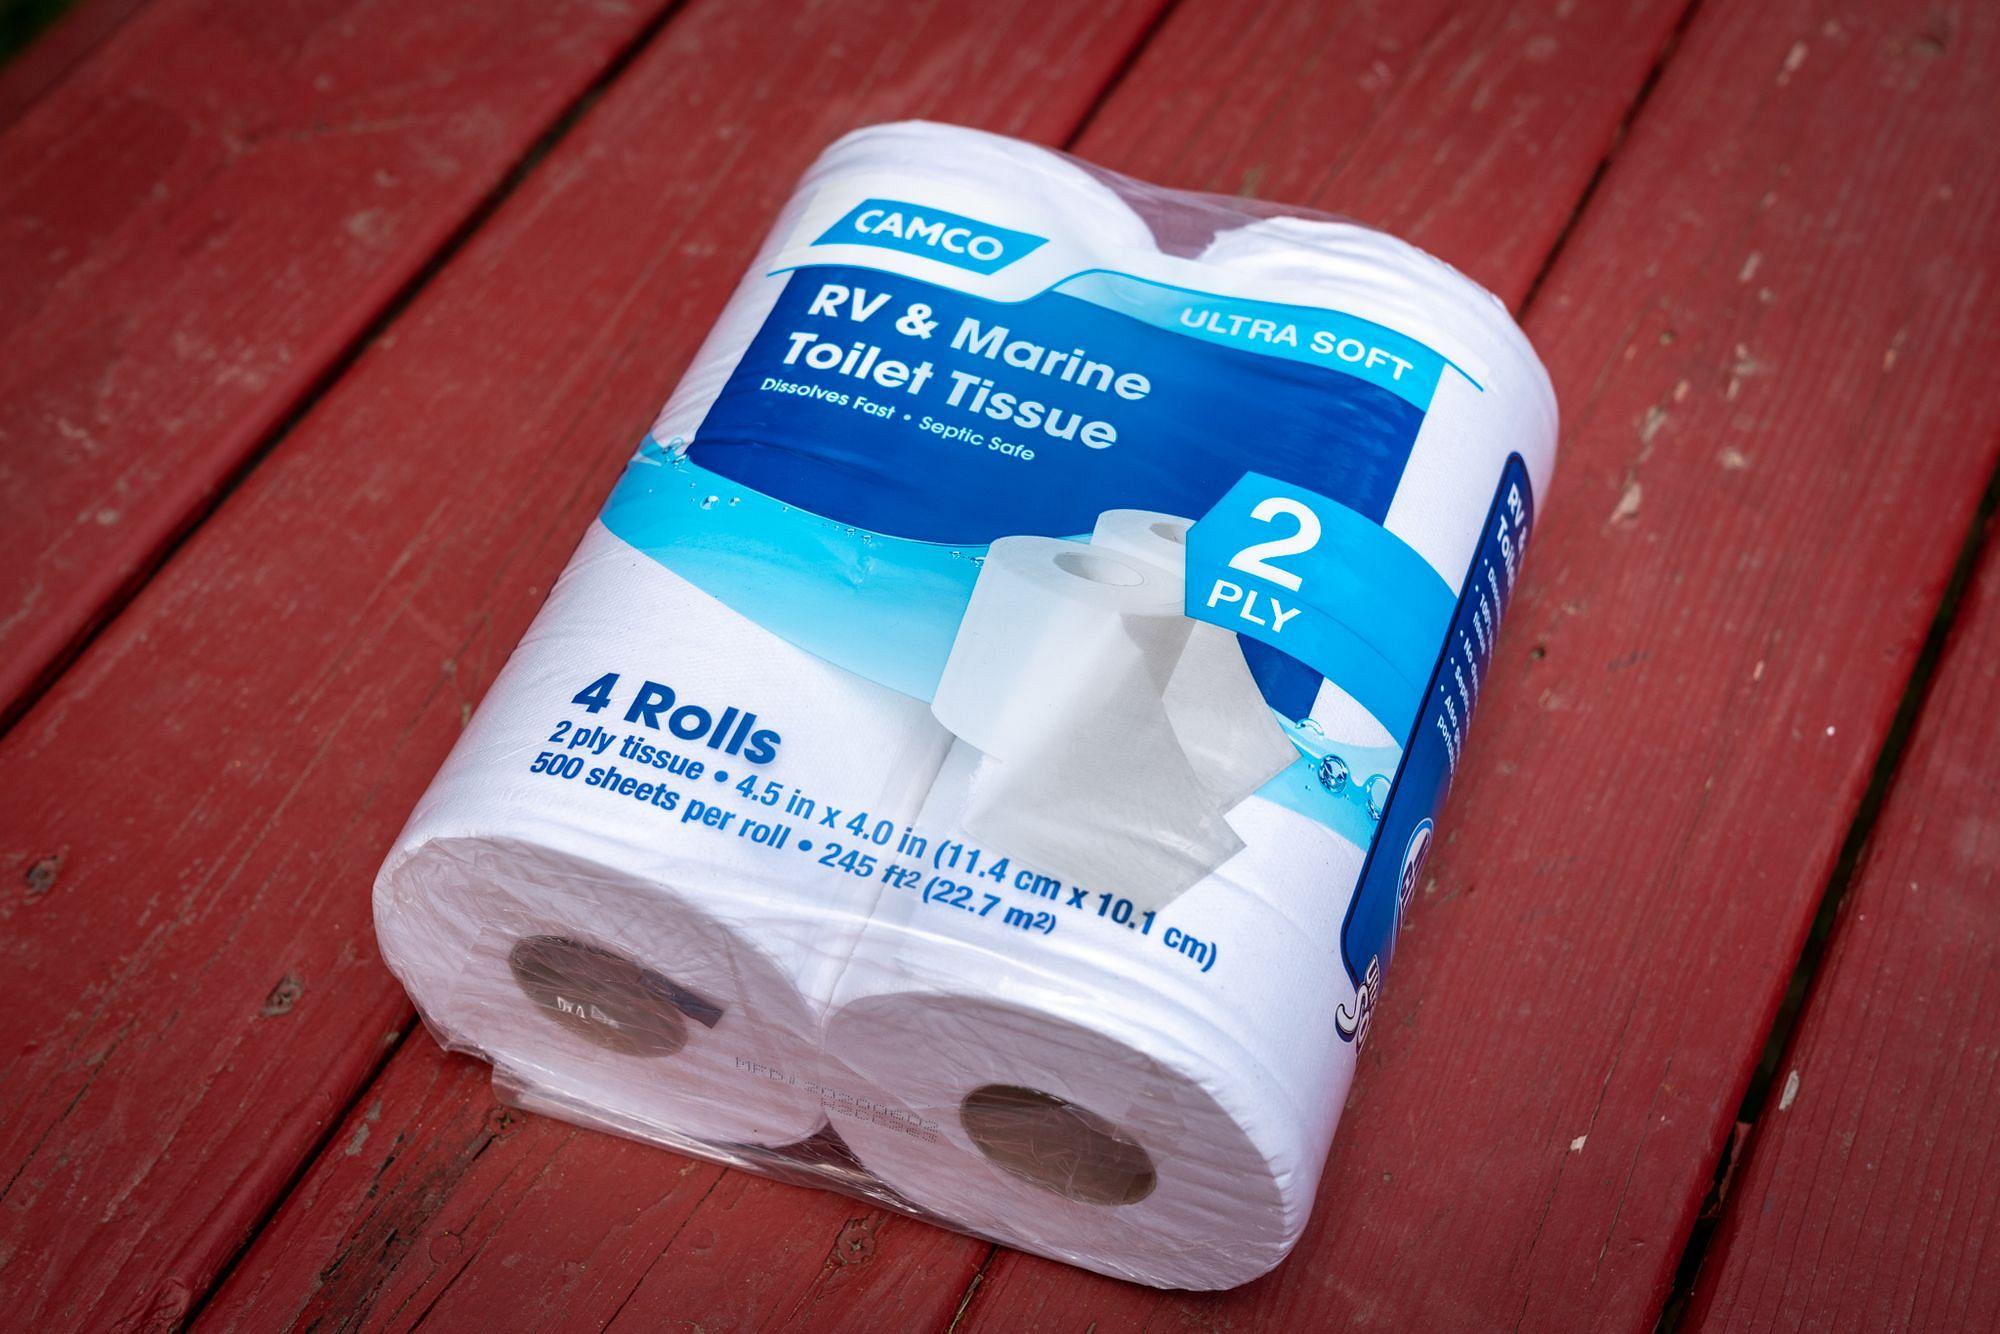 Camco RV Marine Toilet Tissue